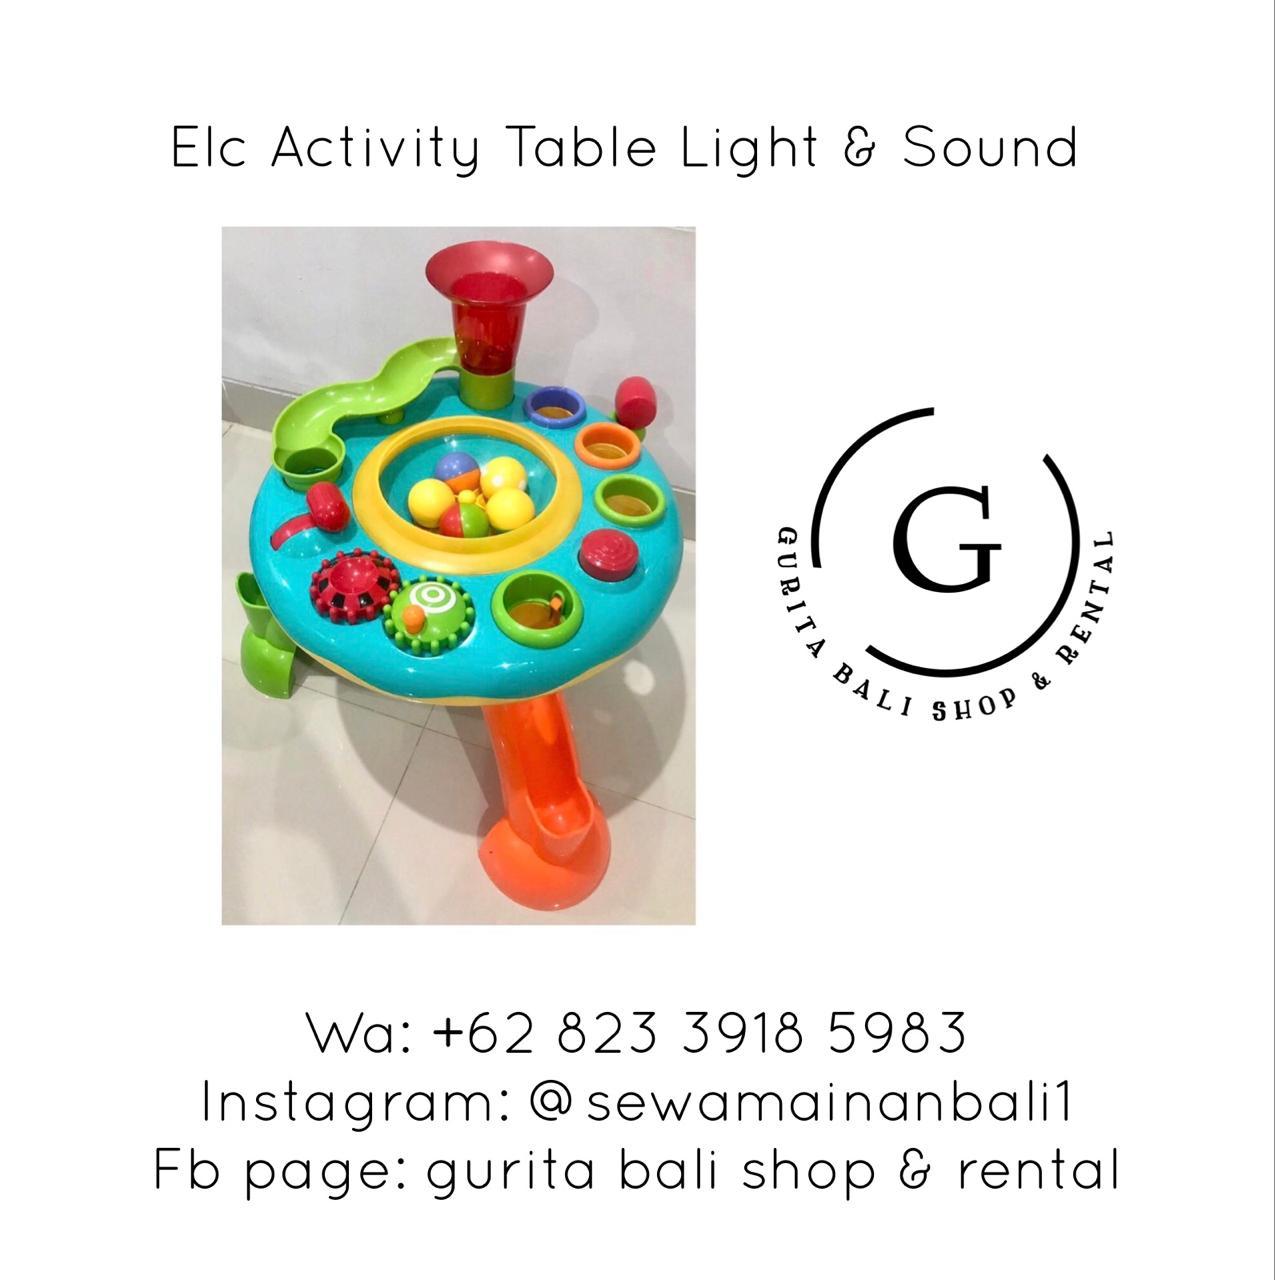 ELC ACTIVITY TABLE LIGHT & SOUND